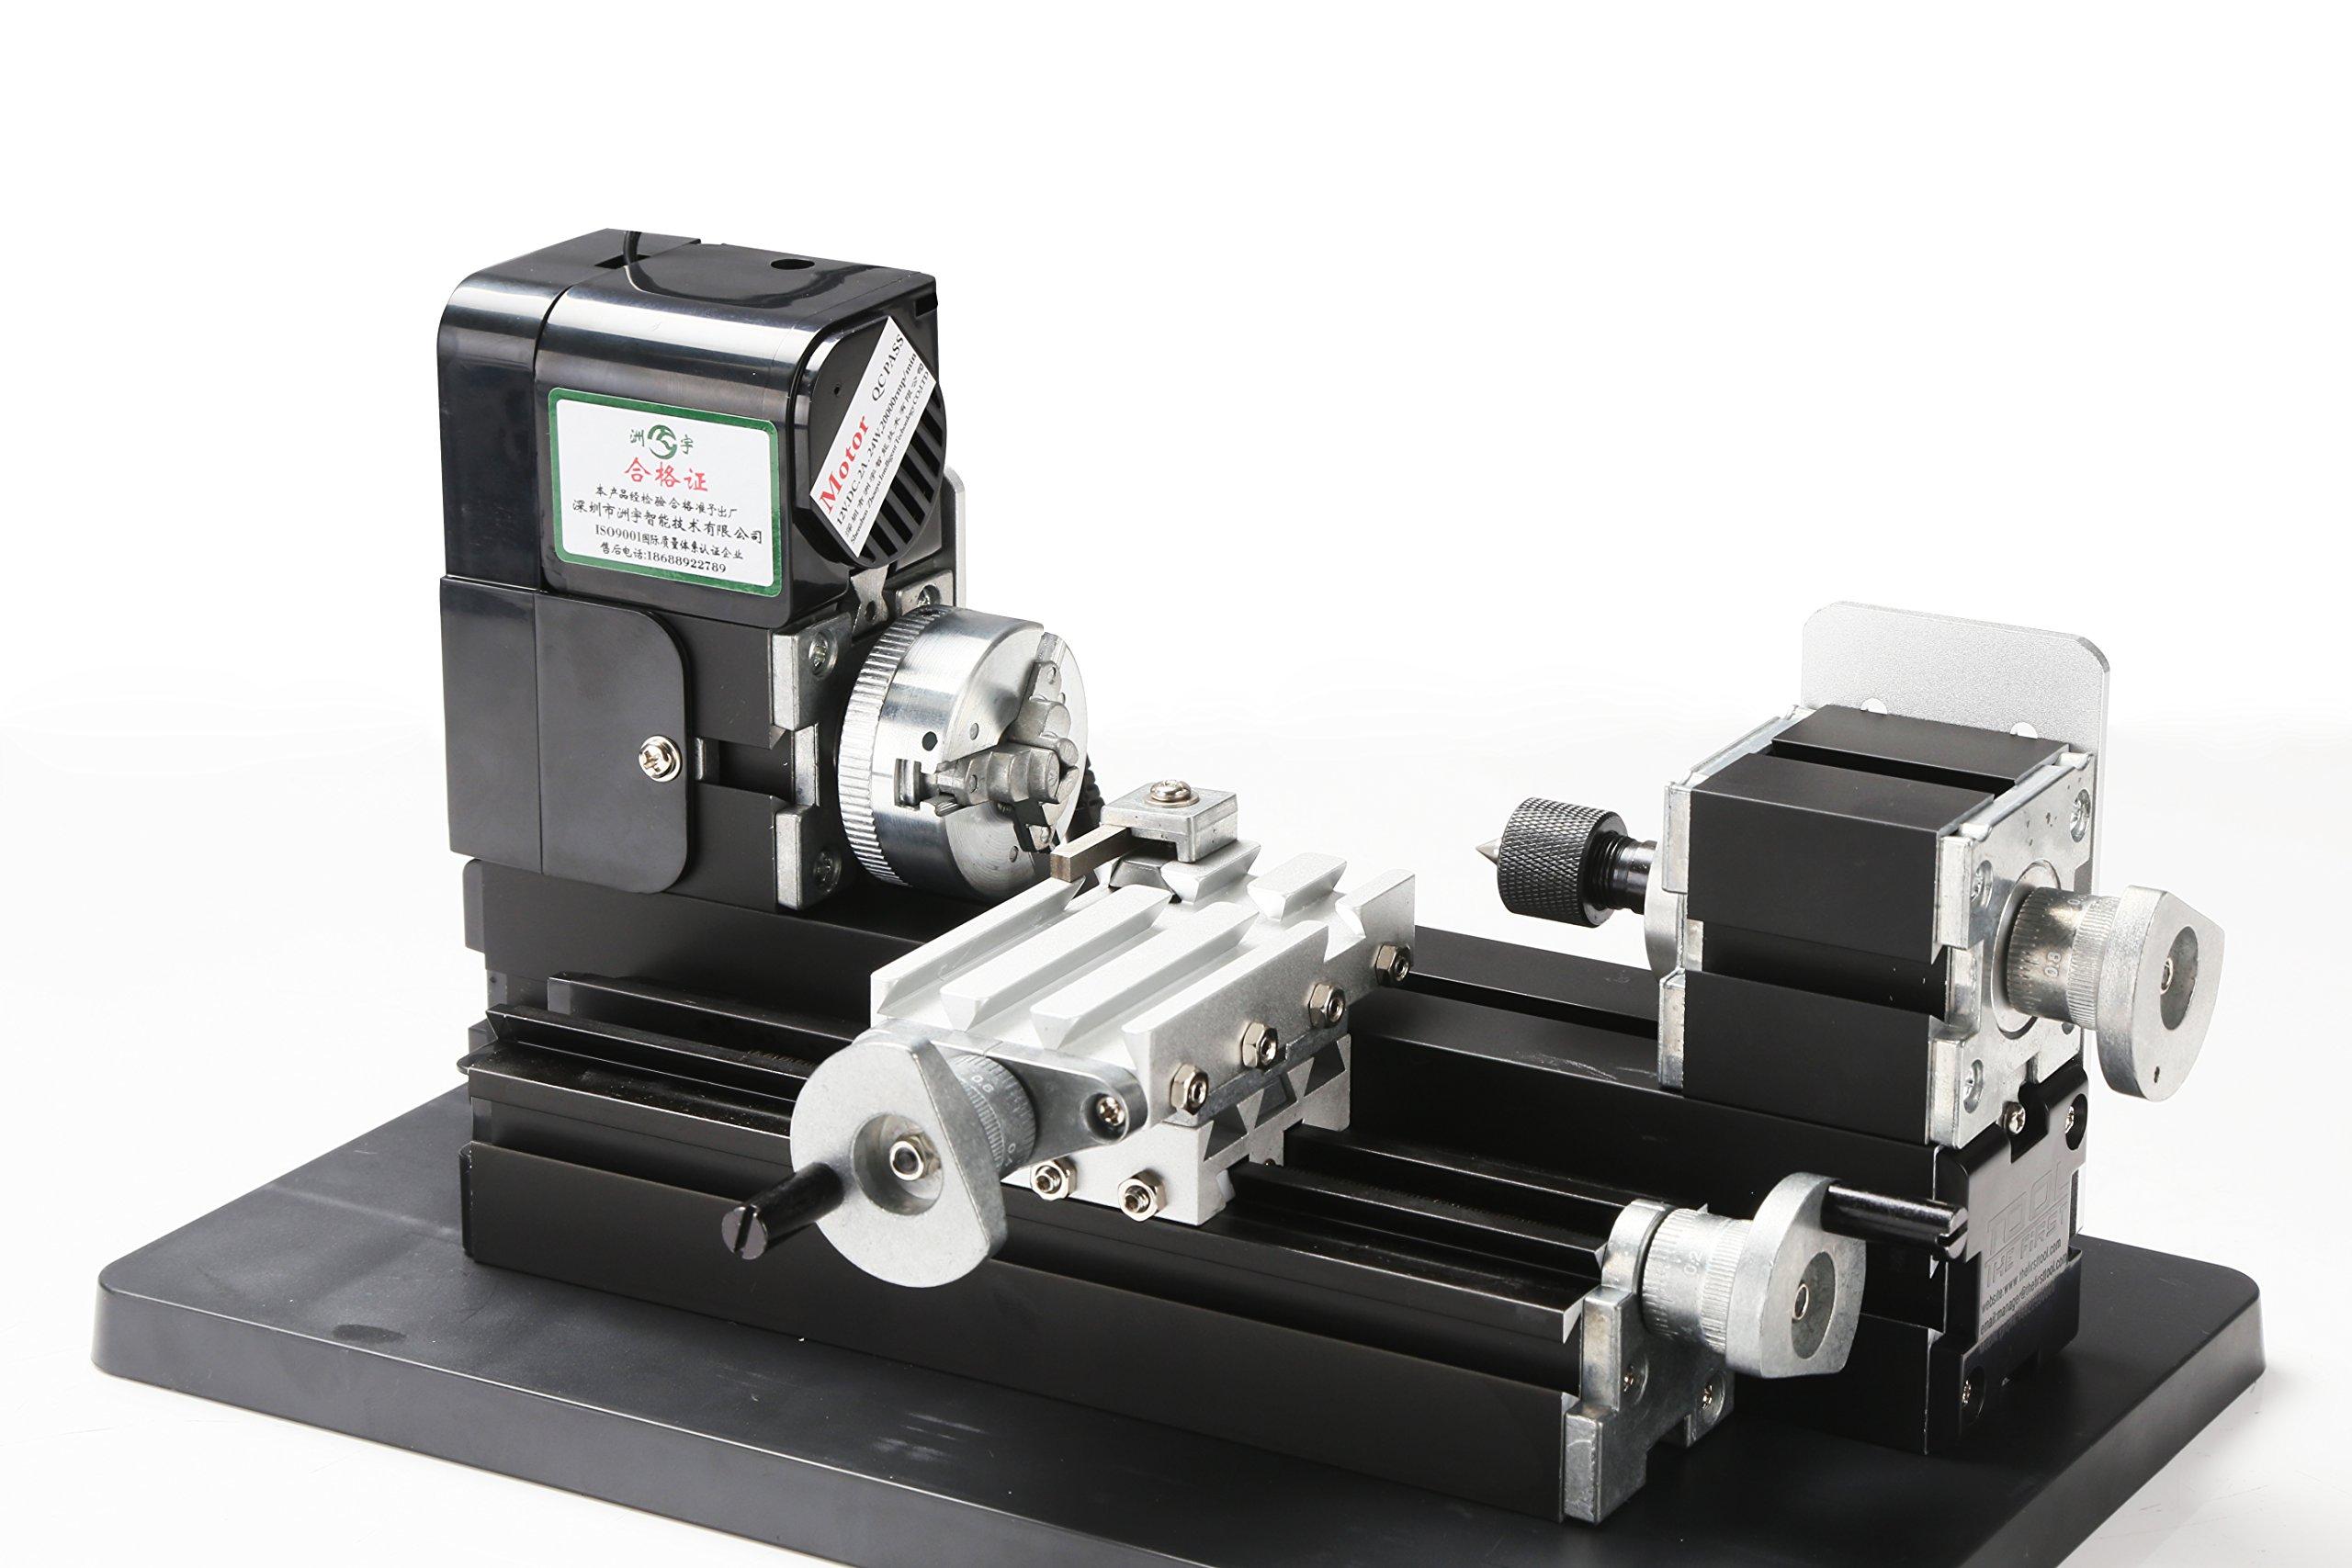 24W All Metal Mini Lathe, use 20,000r/min, 24W Motor ,mini lathe for students DIY Works, best gift for Chrildren's Gift.